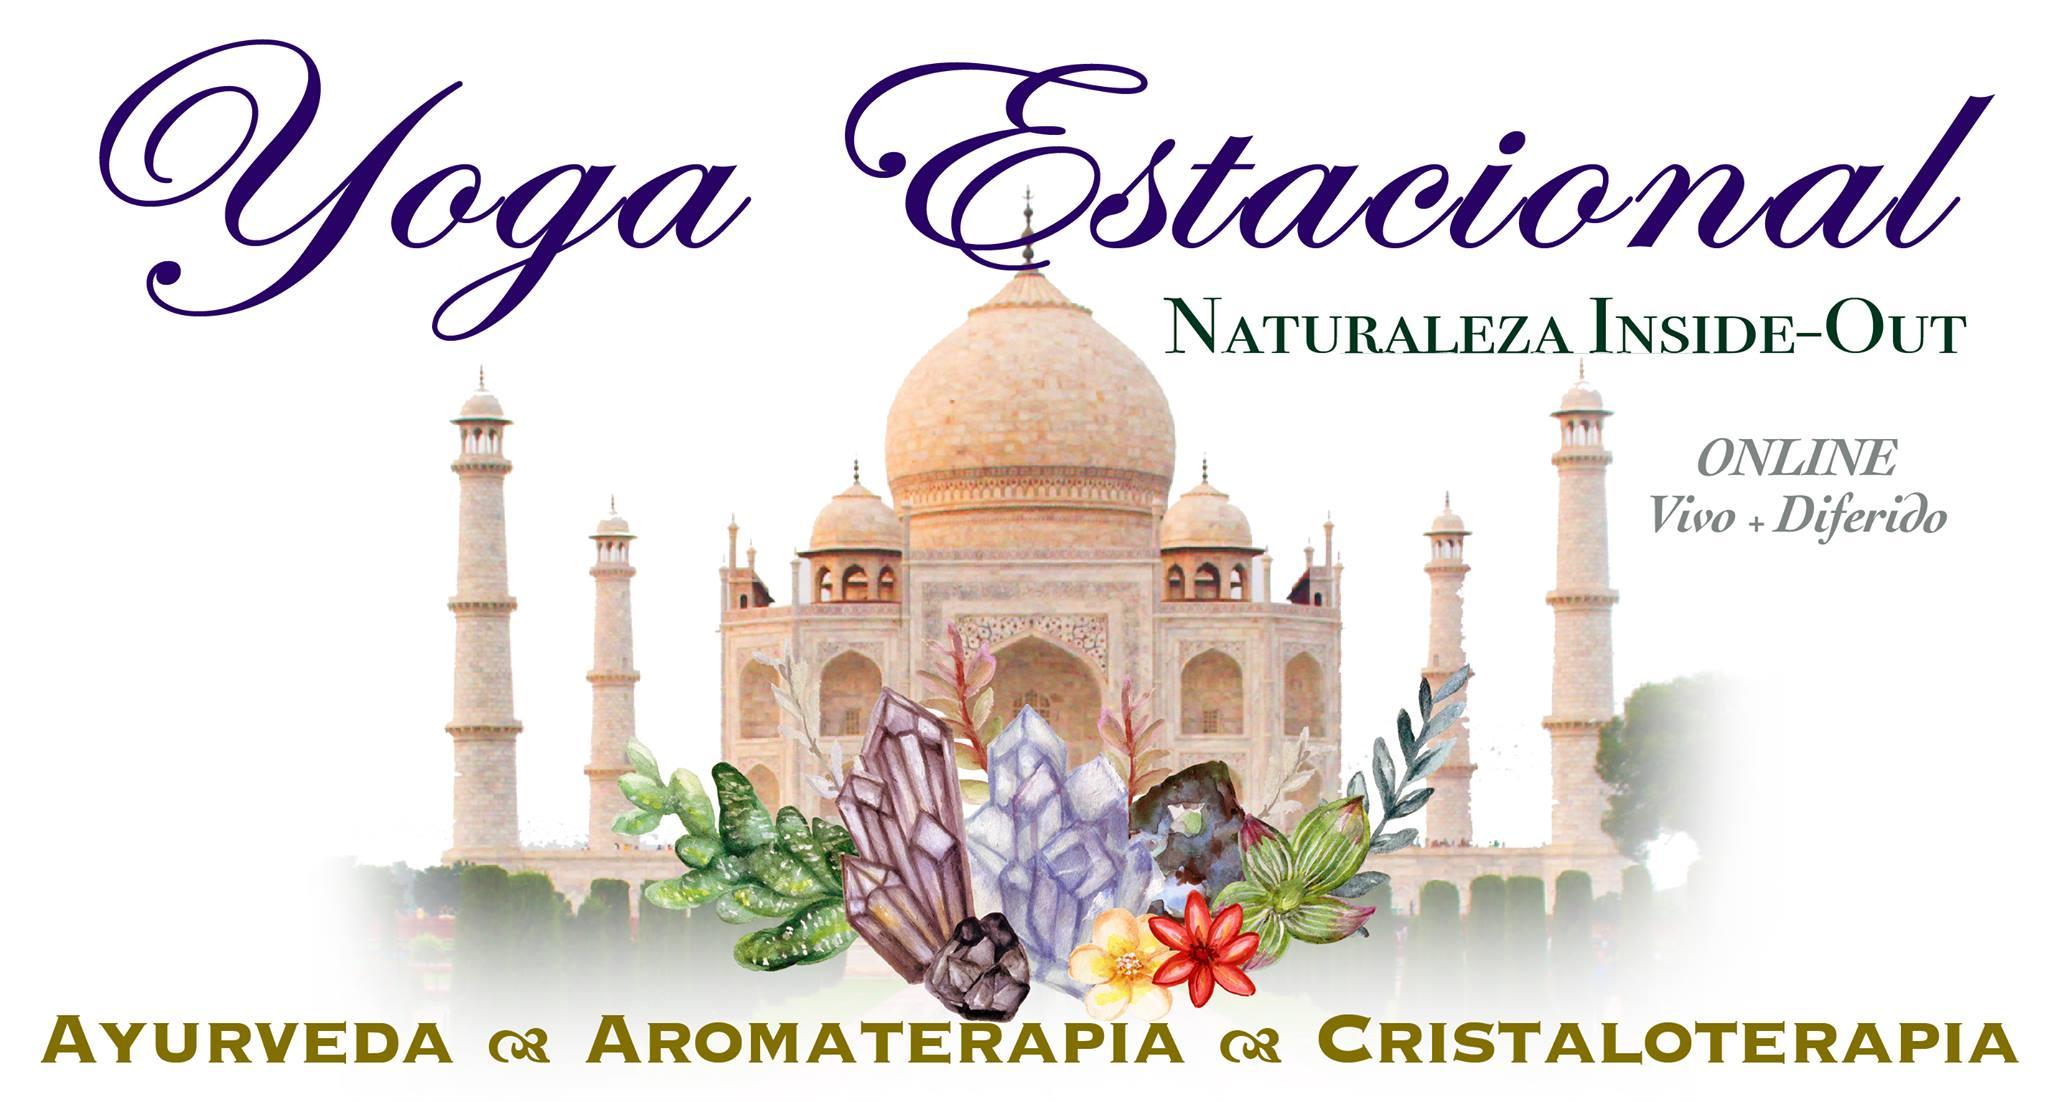 Yoga Estacional. Naturaleza inside out